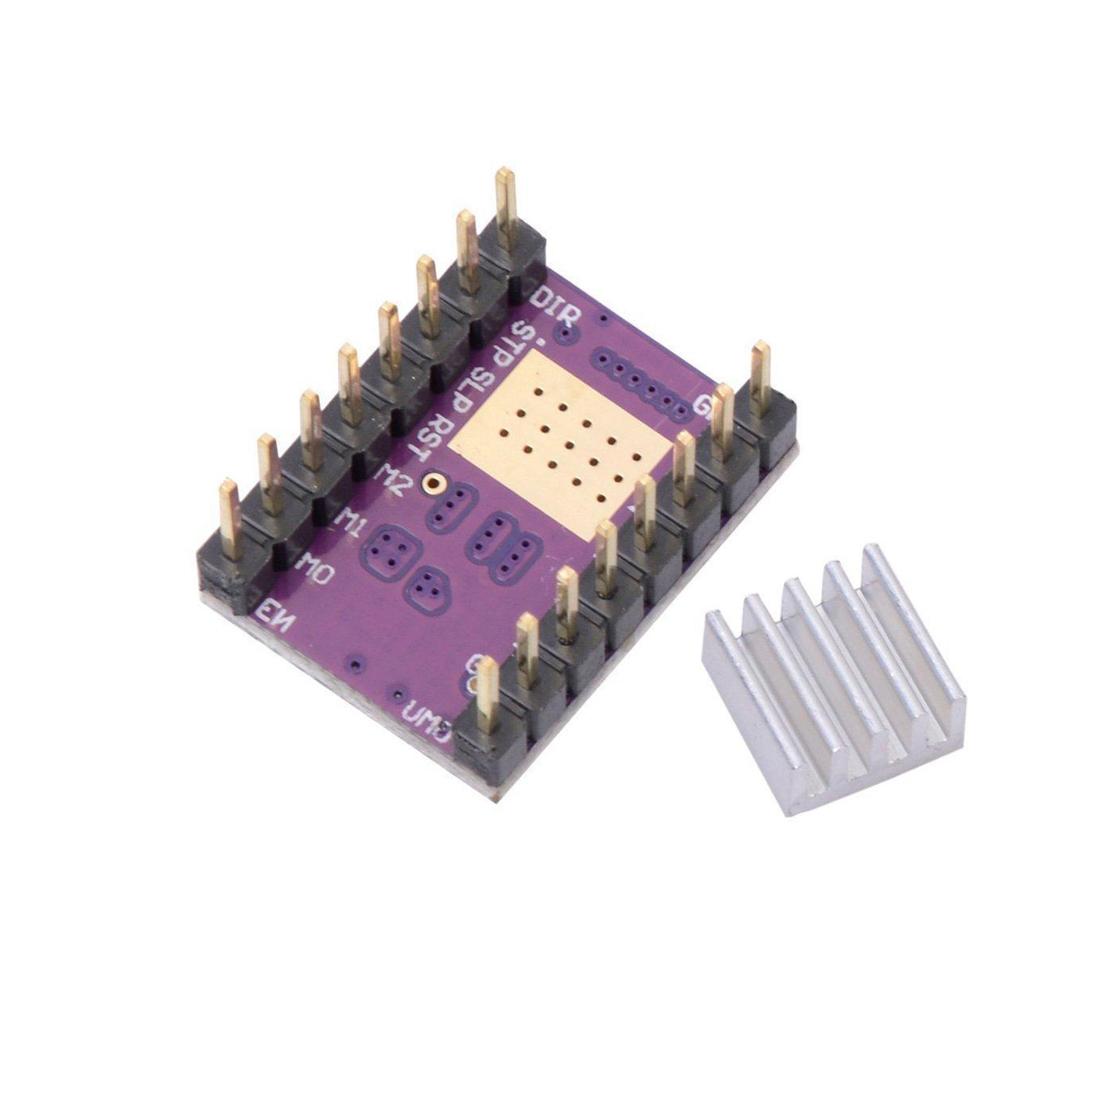 DRV8825 Stepper Motor Driver Module for 3D Printer RepRap 4 RAMPS1.4 StepStick